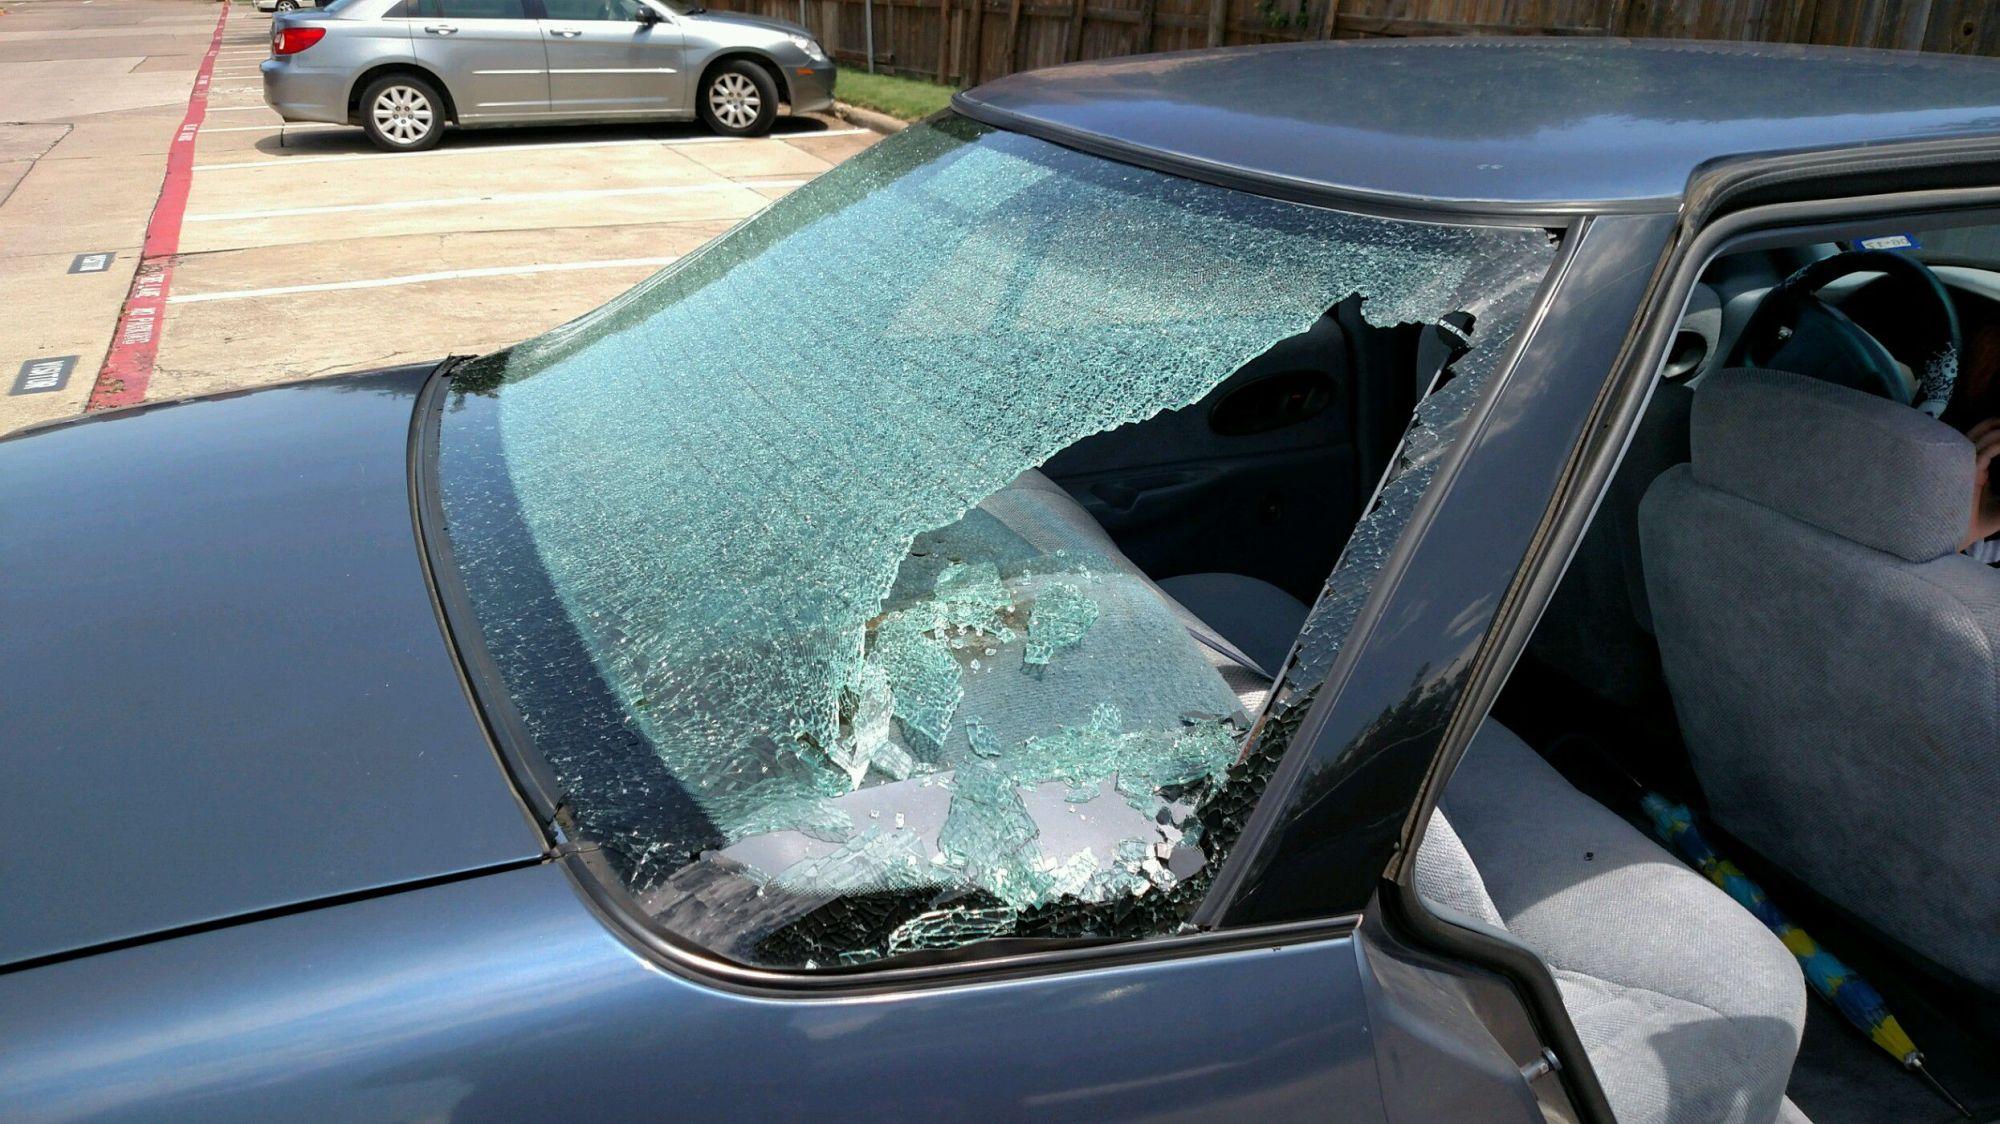 hight resolution of 1997 oldsmobile achieva 4 door sedan windshield 1996 oldsmobile cutlass supreme 4 door sedan back glass heated